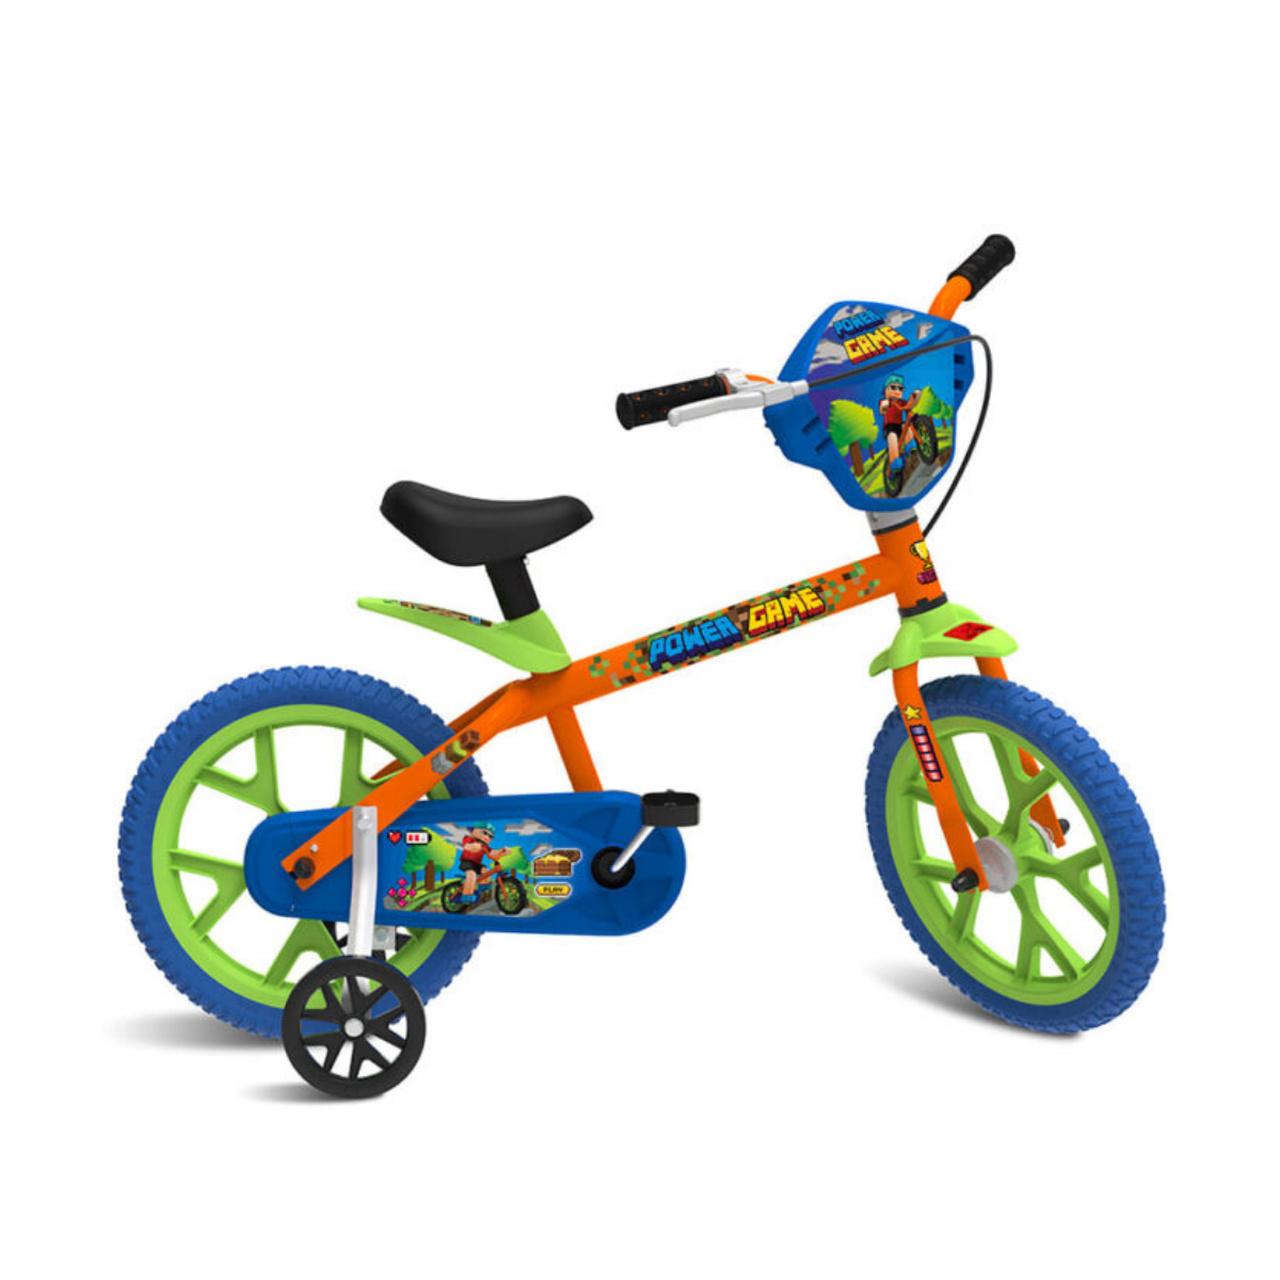 Bicicleta Bandeirante Menino Power Game Aro14 Lj/Vd Ref:3066